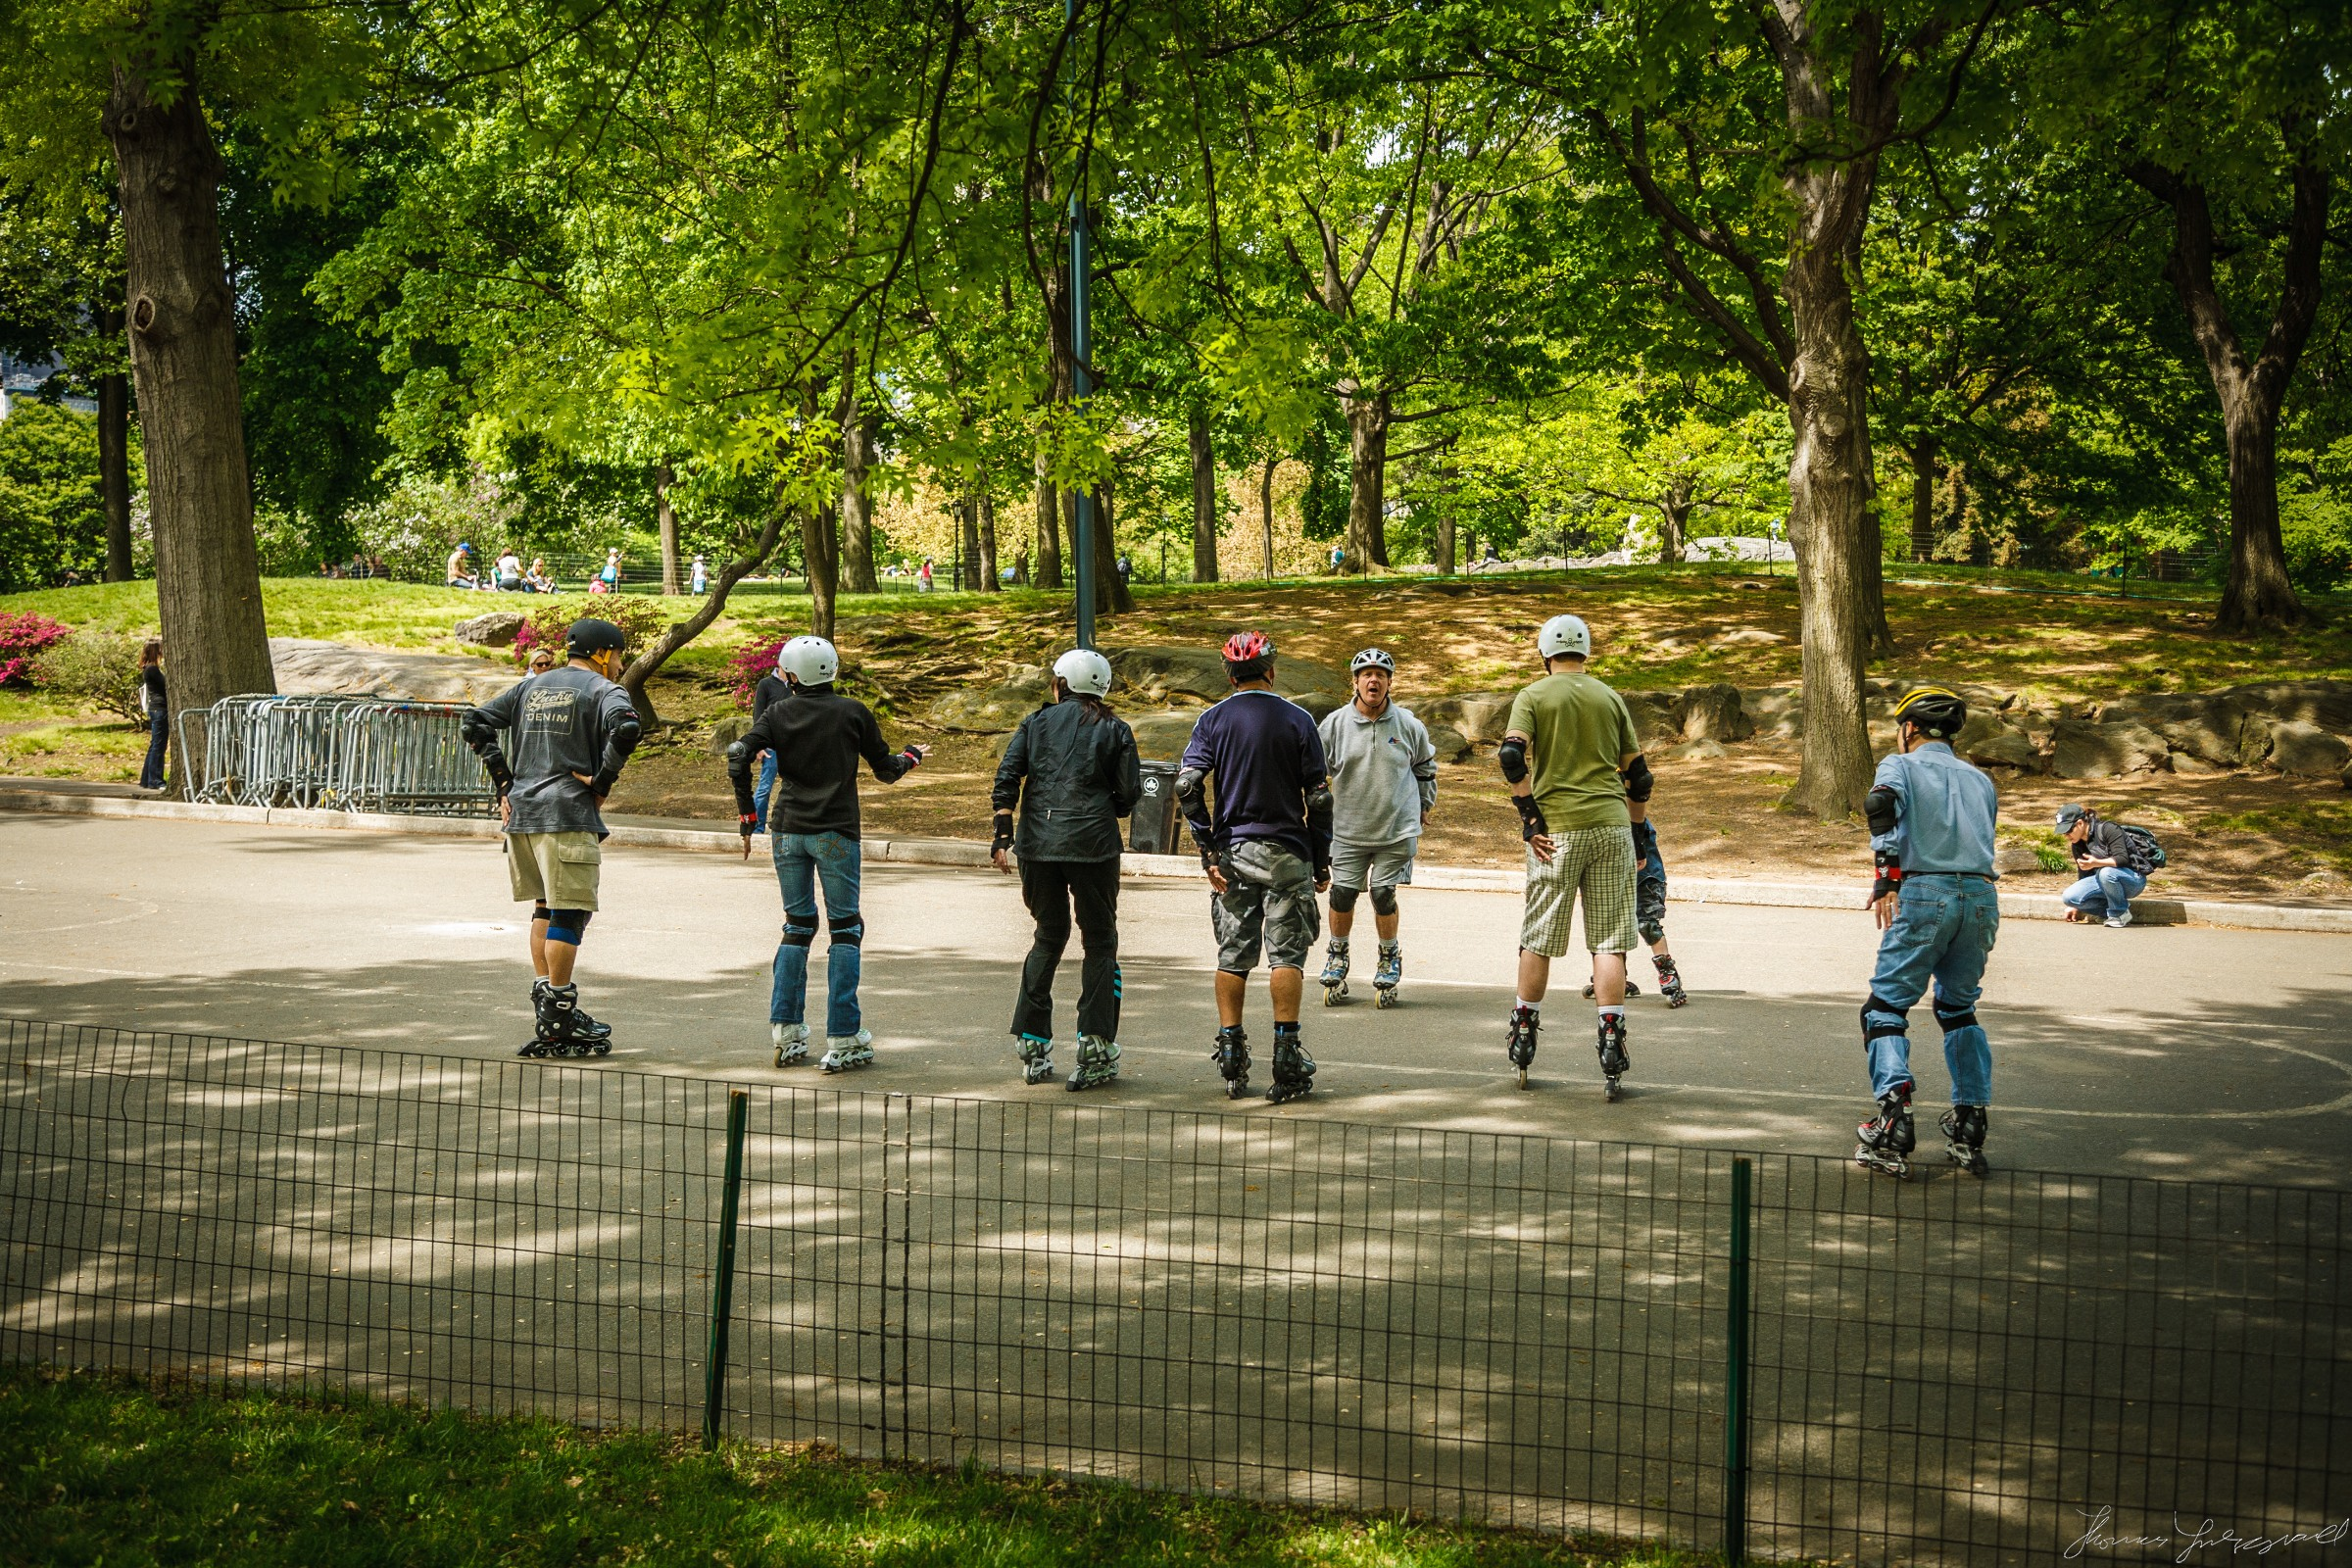 Central-Park-New-York-City-4.jpg